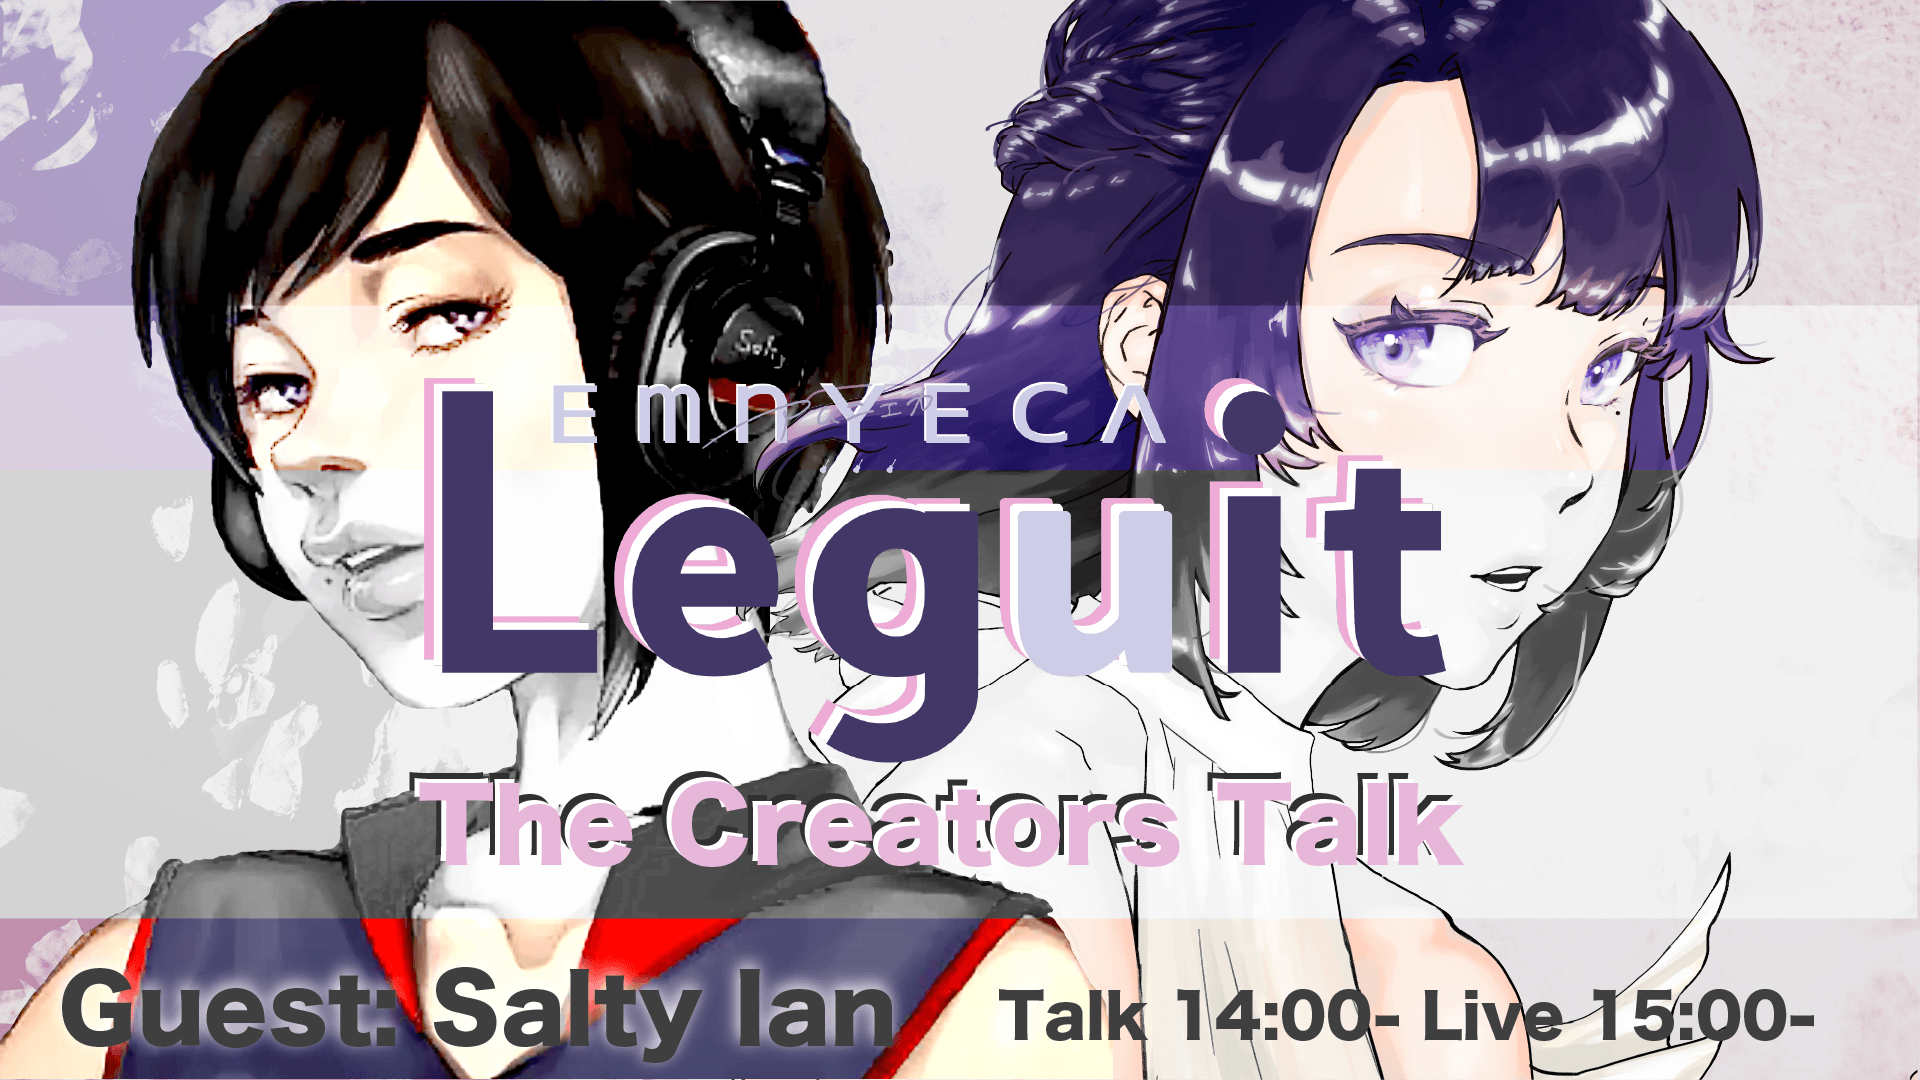 LeguitCT1